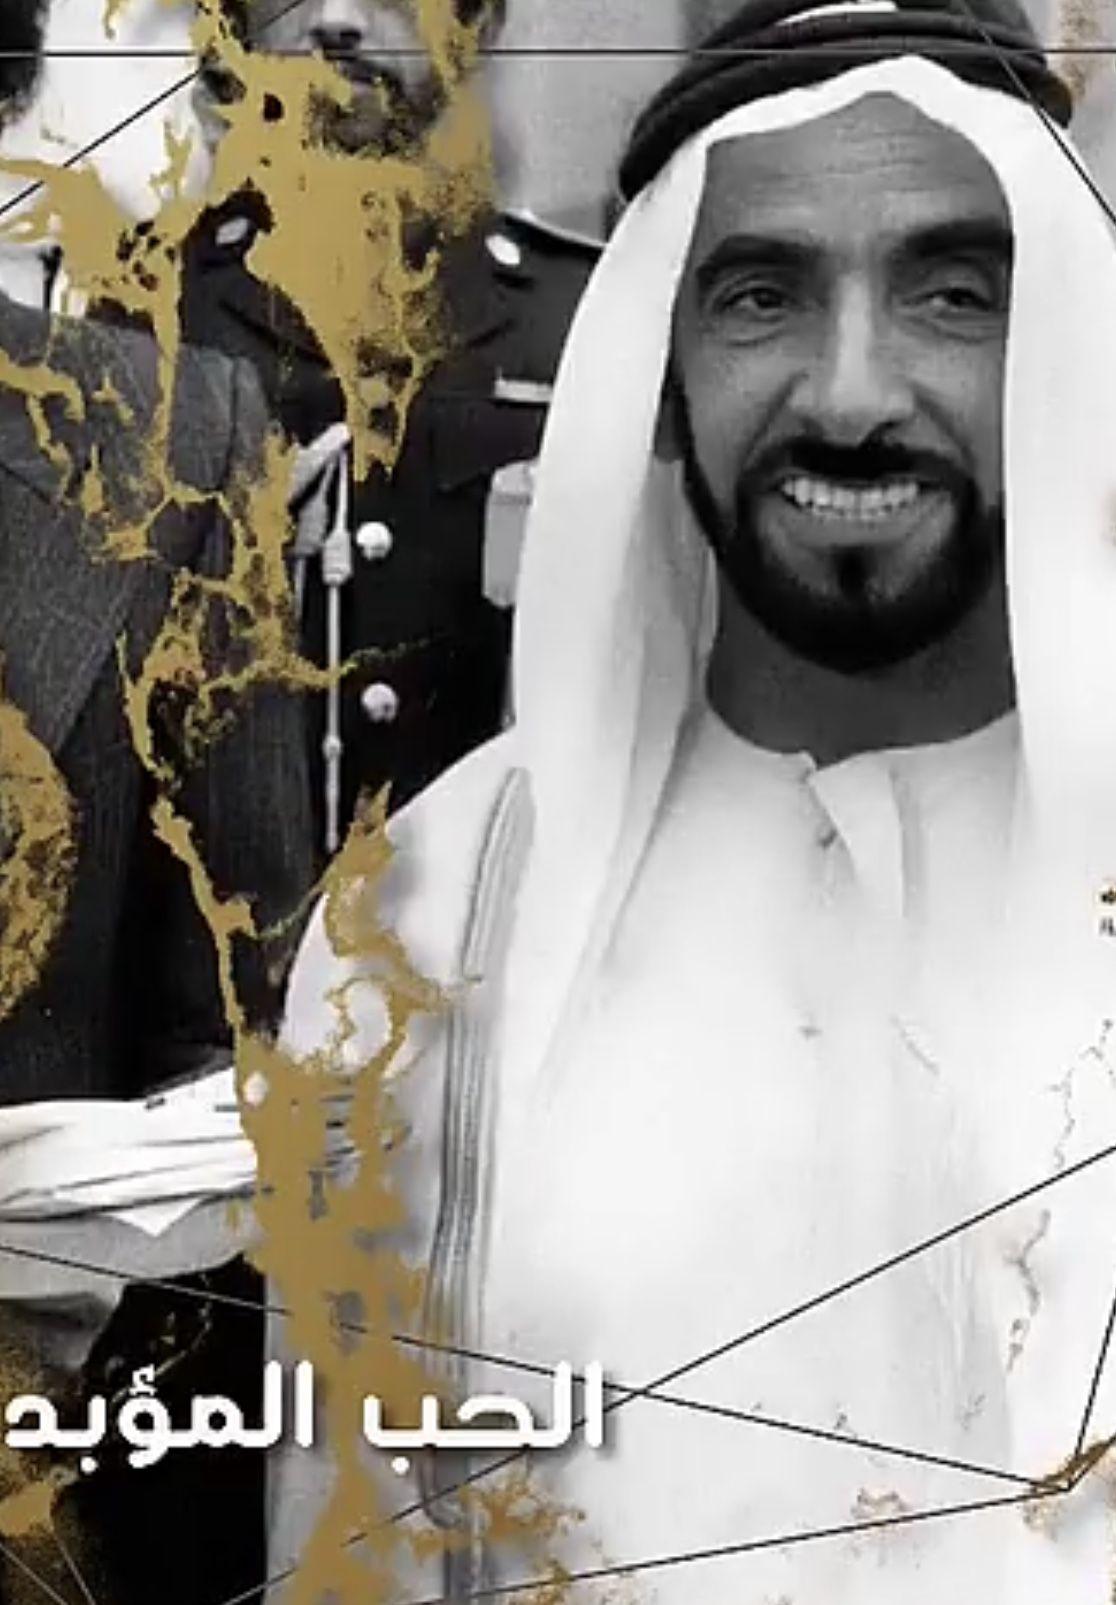 الشيخ زايد بن سلطان آل نهيان رحمة الله عليه History Uae United Arab Emirates Emirates